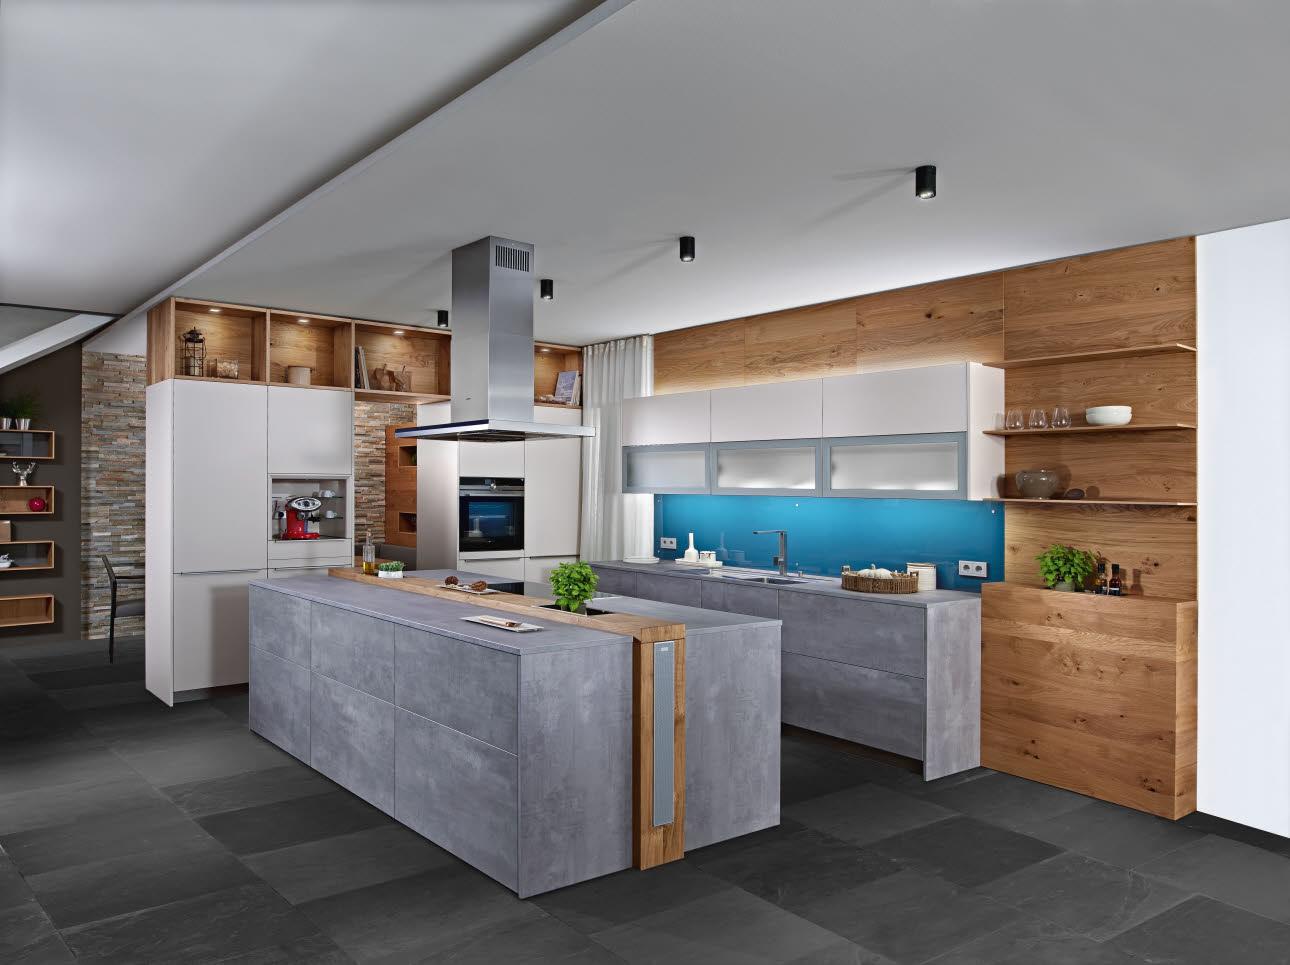 beton optik k che k chenmodelle ewe k chen. Black Bedroom Furniture Sets. Home Design Ideas